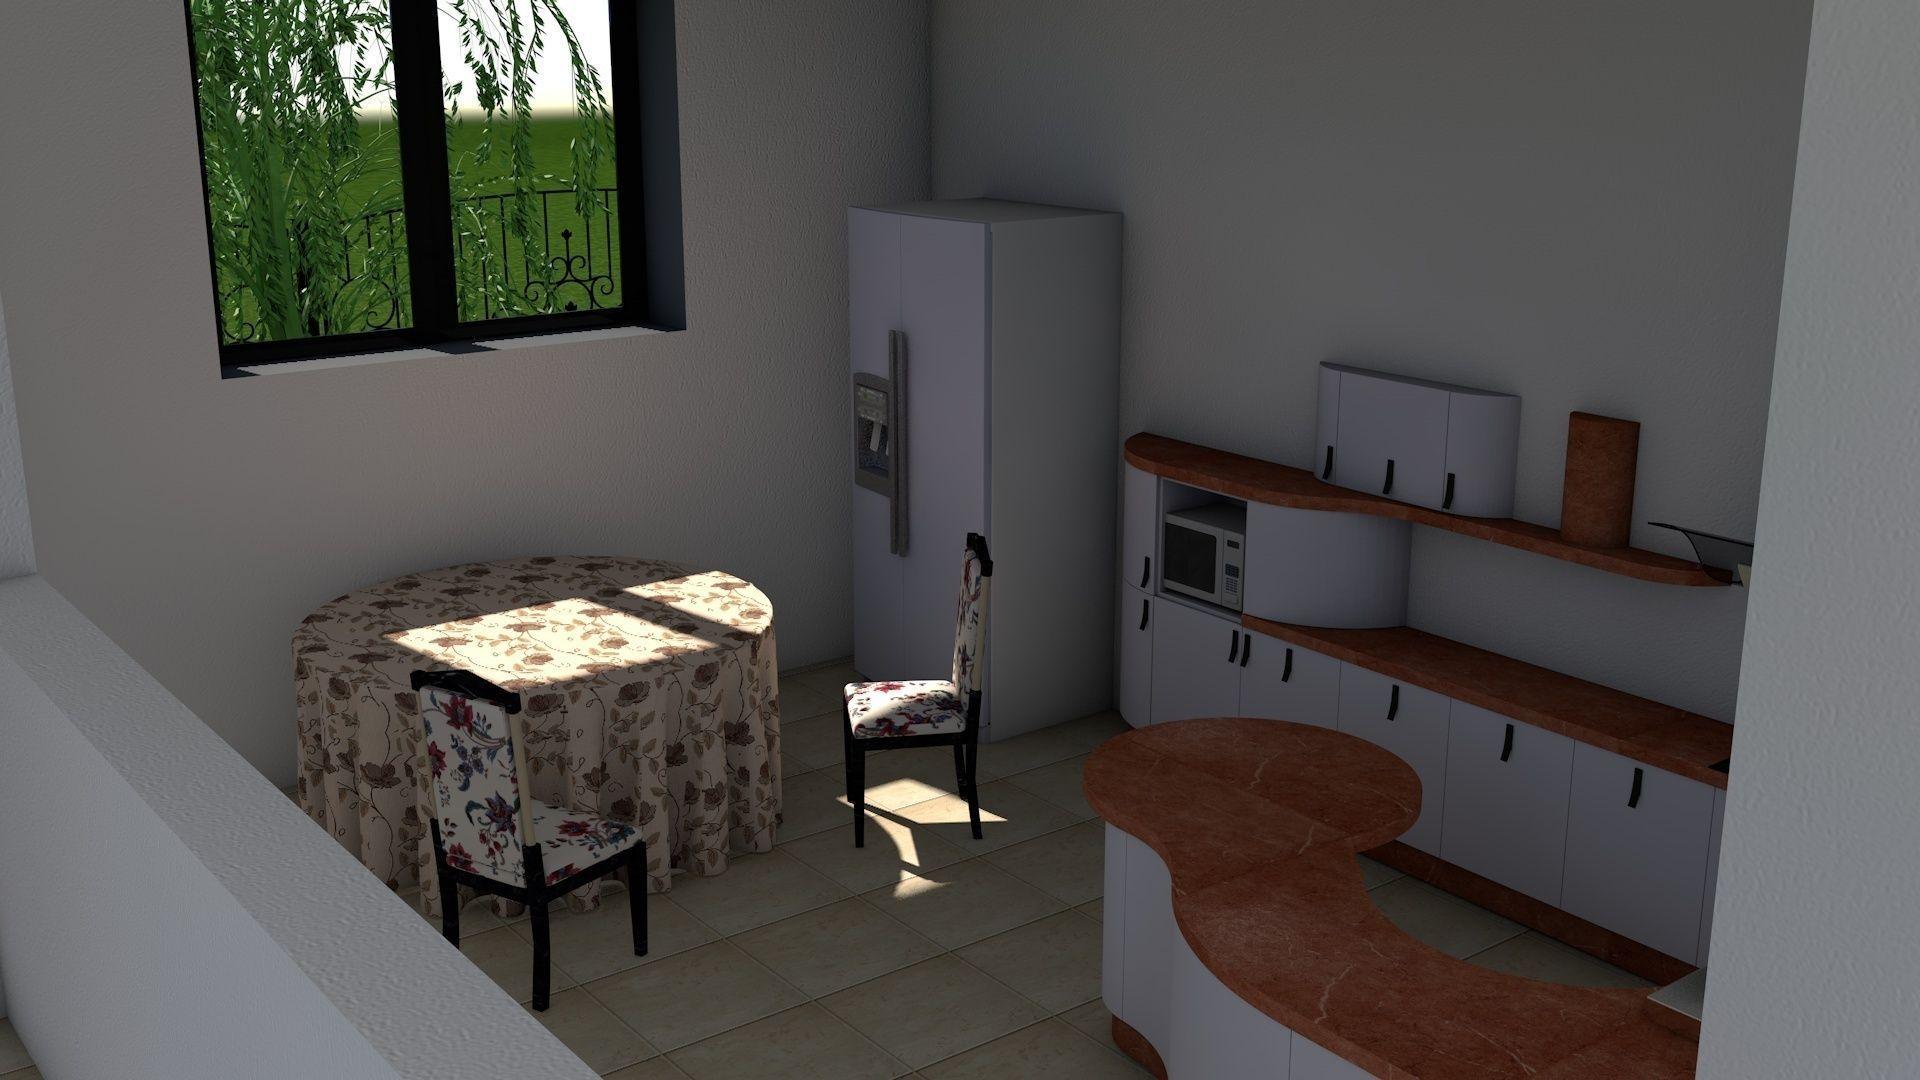 Modern house interior exterior design 3d model c4d 8